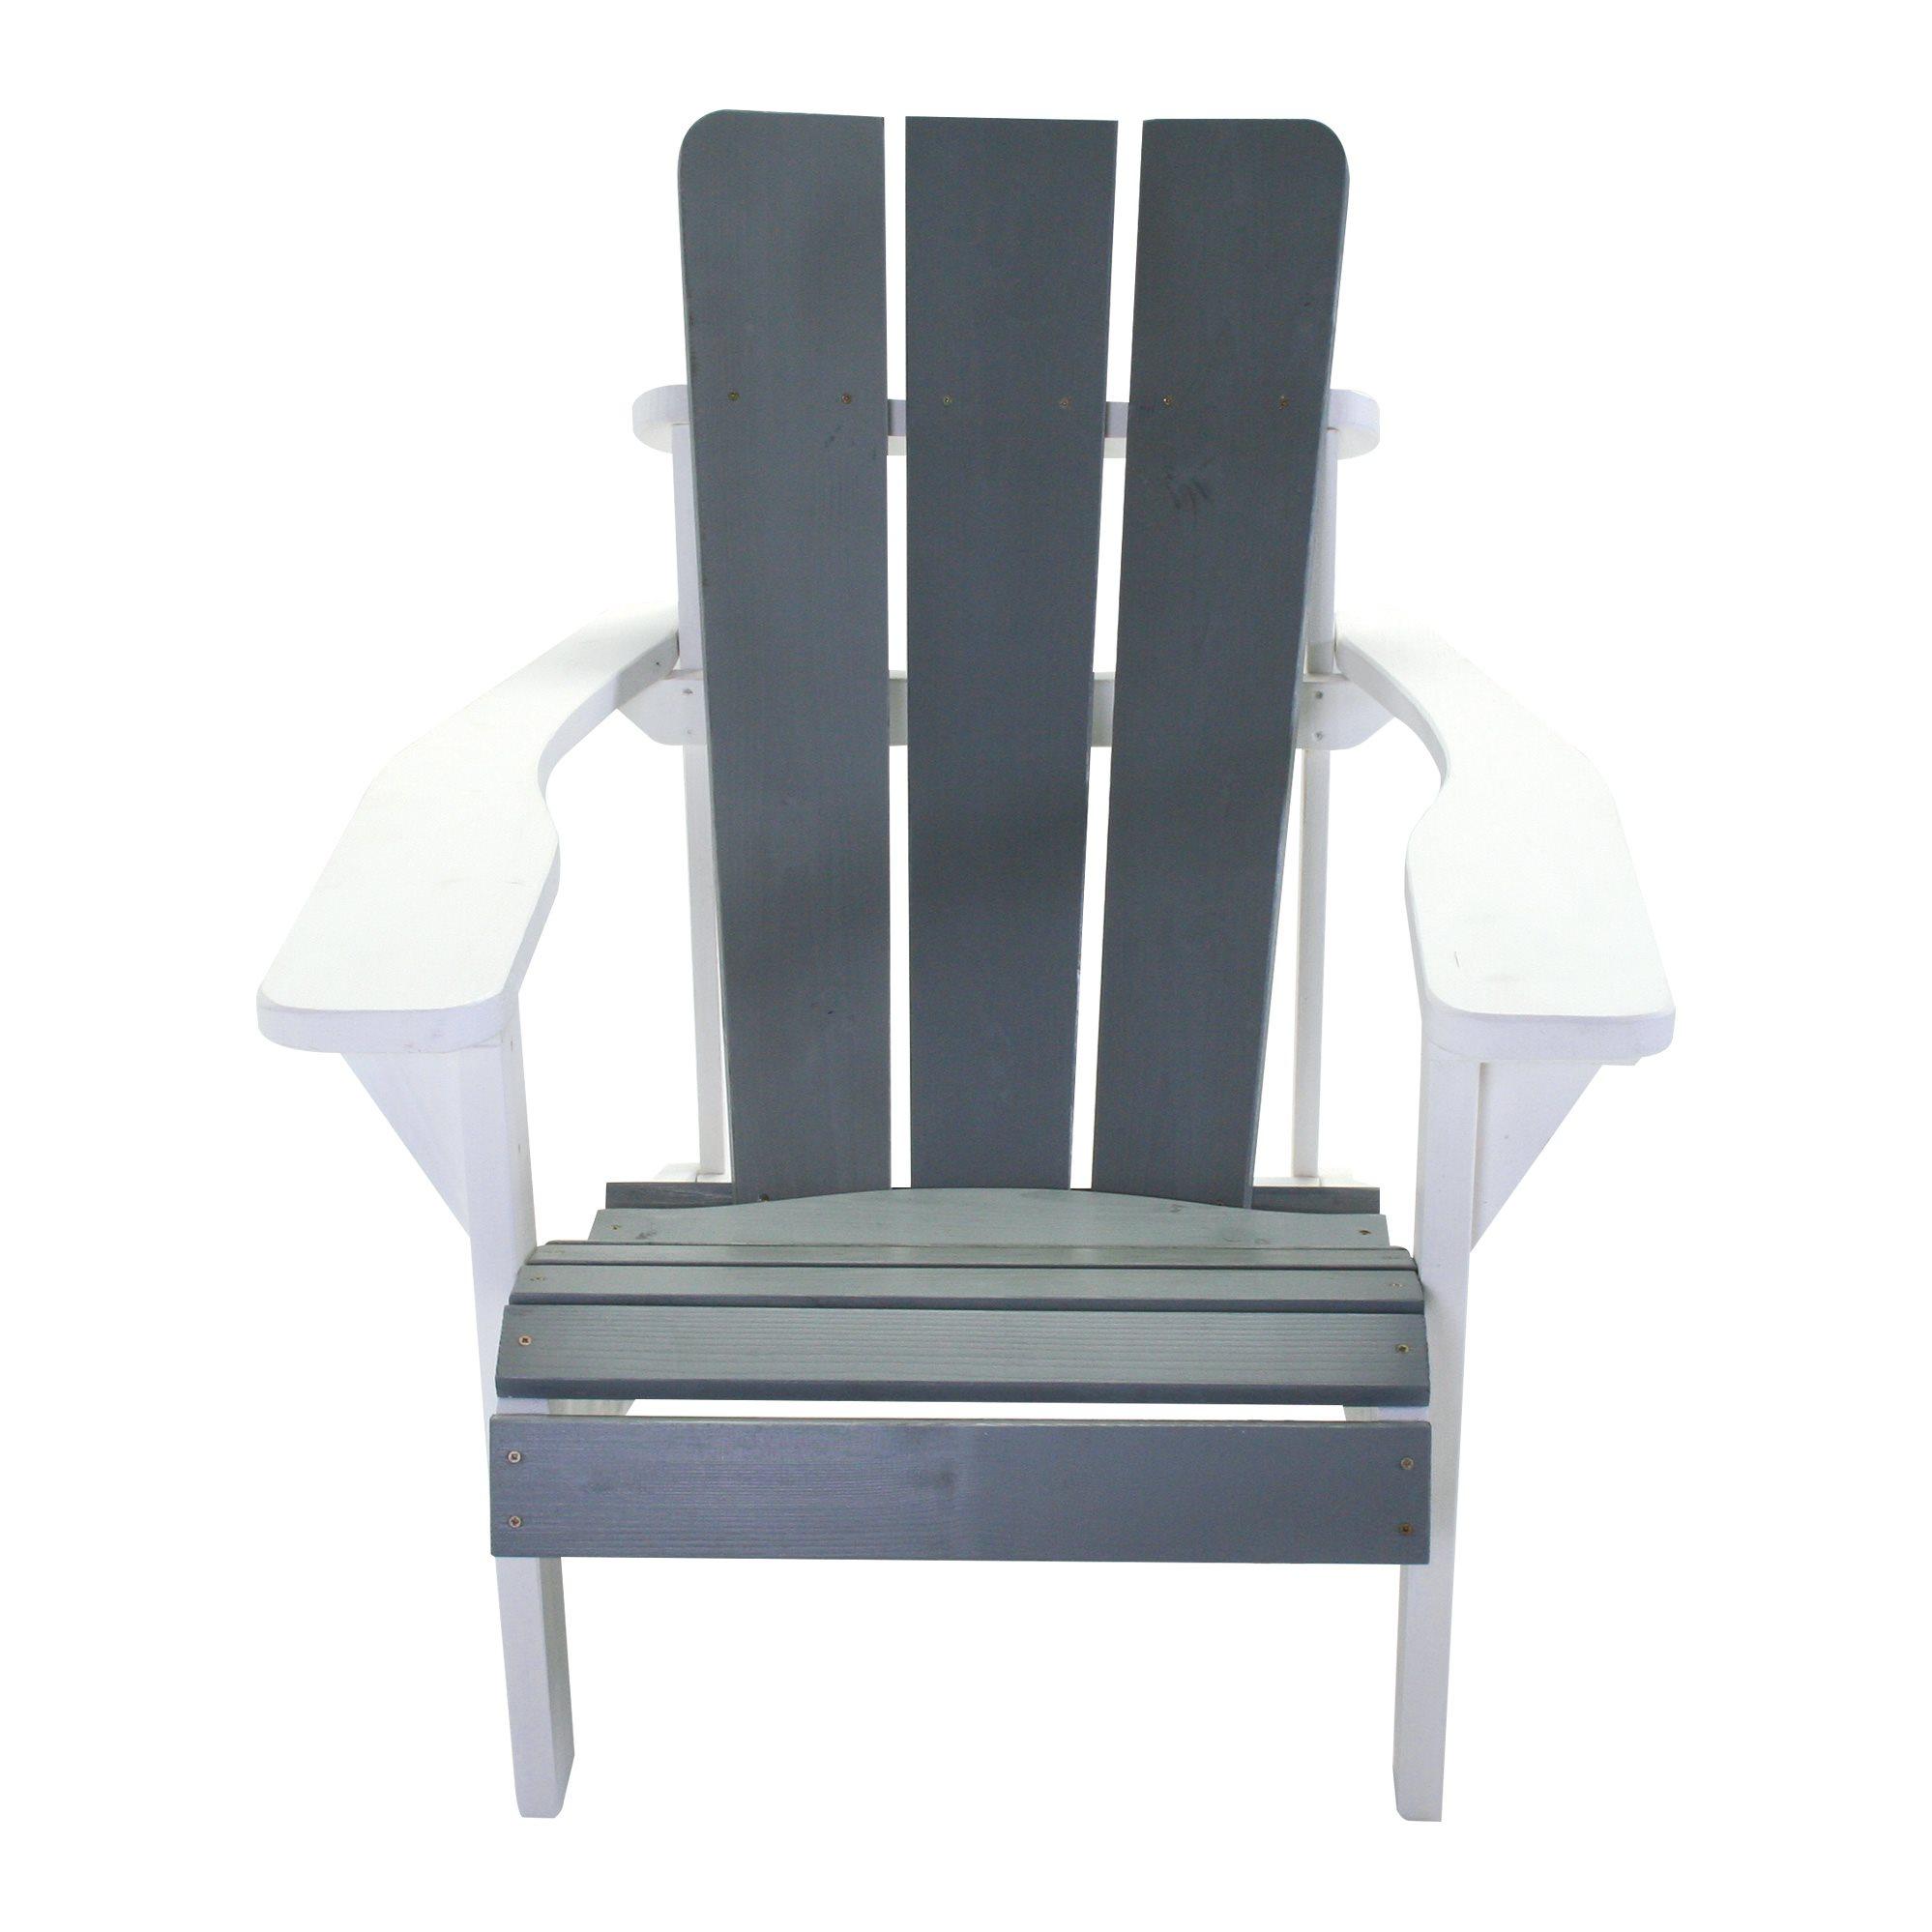 SenS-Line Montreal stoel, afm. ca 75 x 77,5 x 89,5 cm, vurenhout, wit-grijs